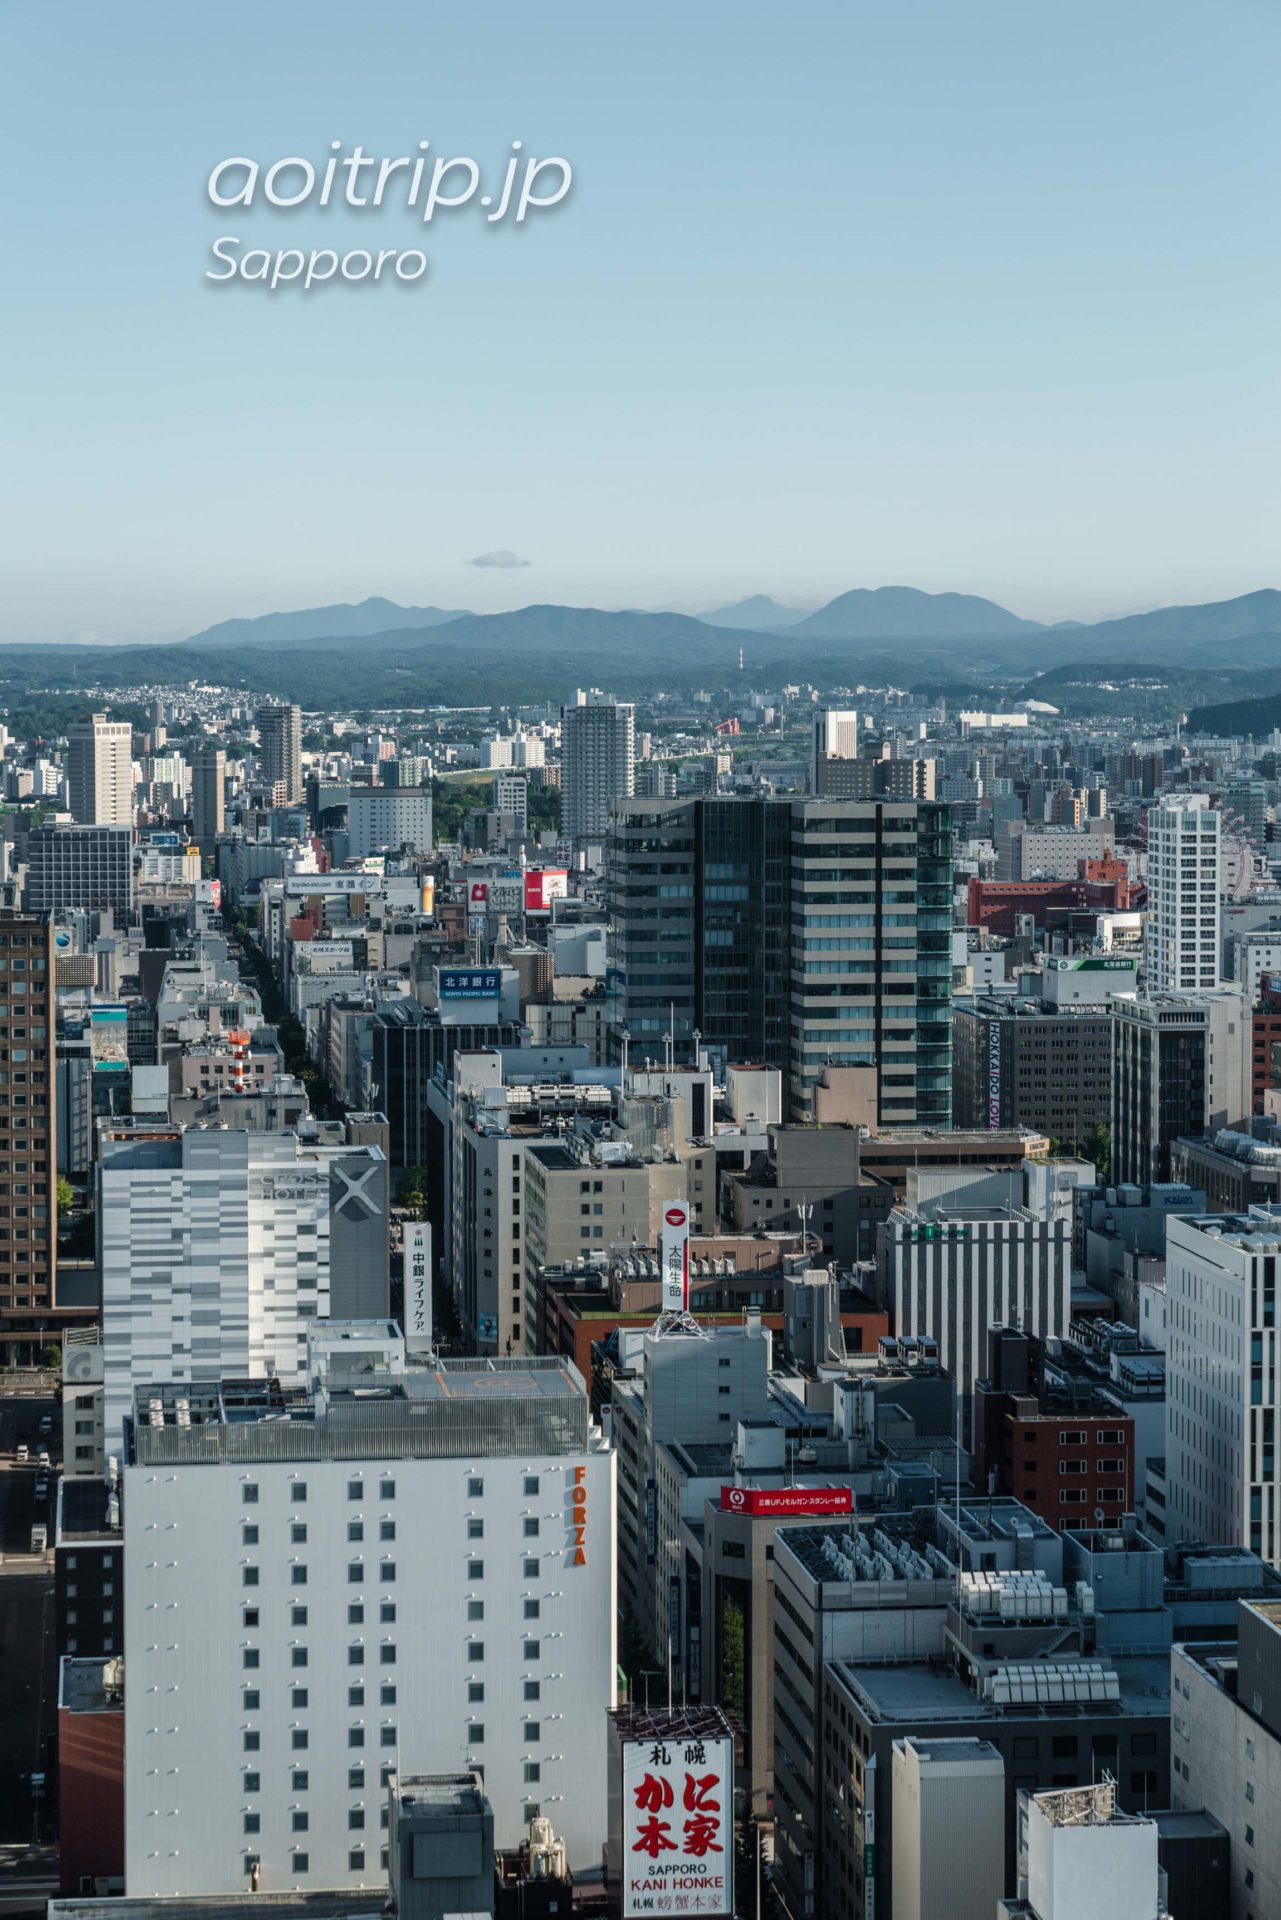 JRタワーホテル日航札幌のモデレートツインルーム客室 南側の眺望